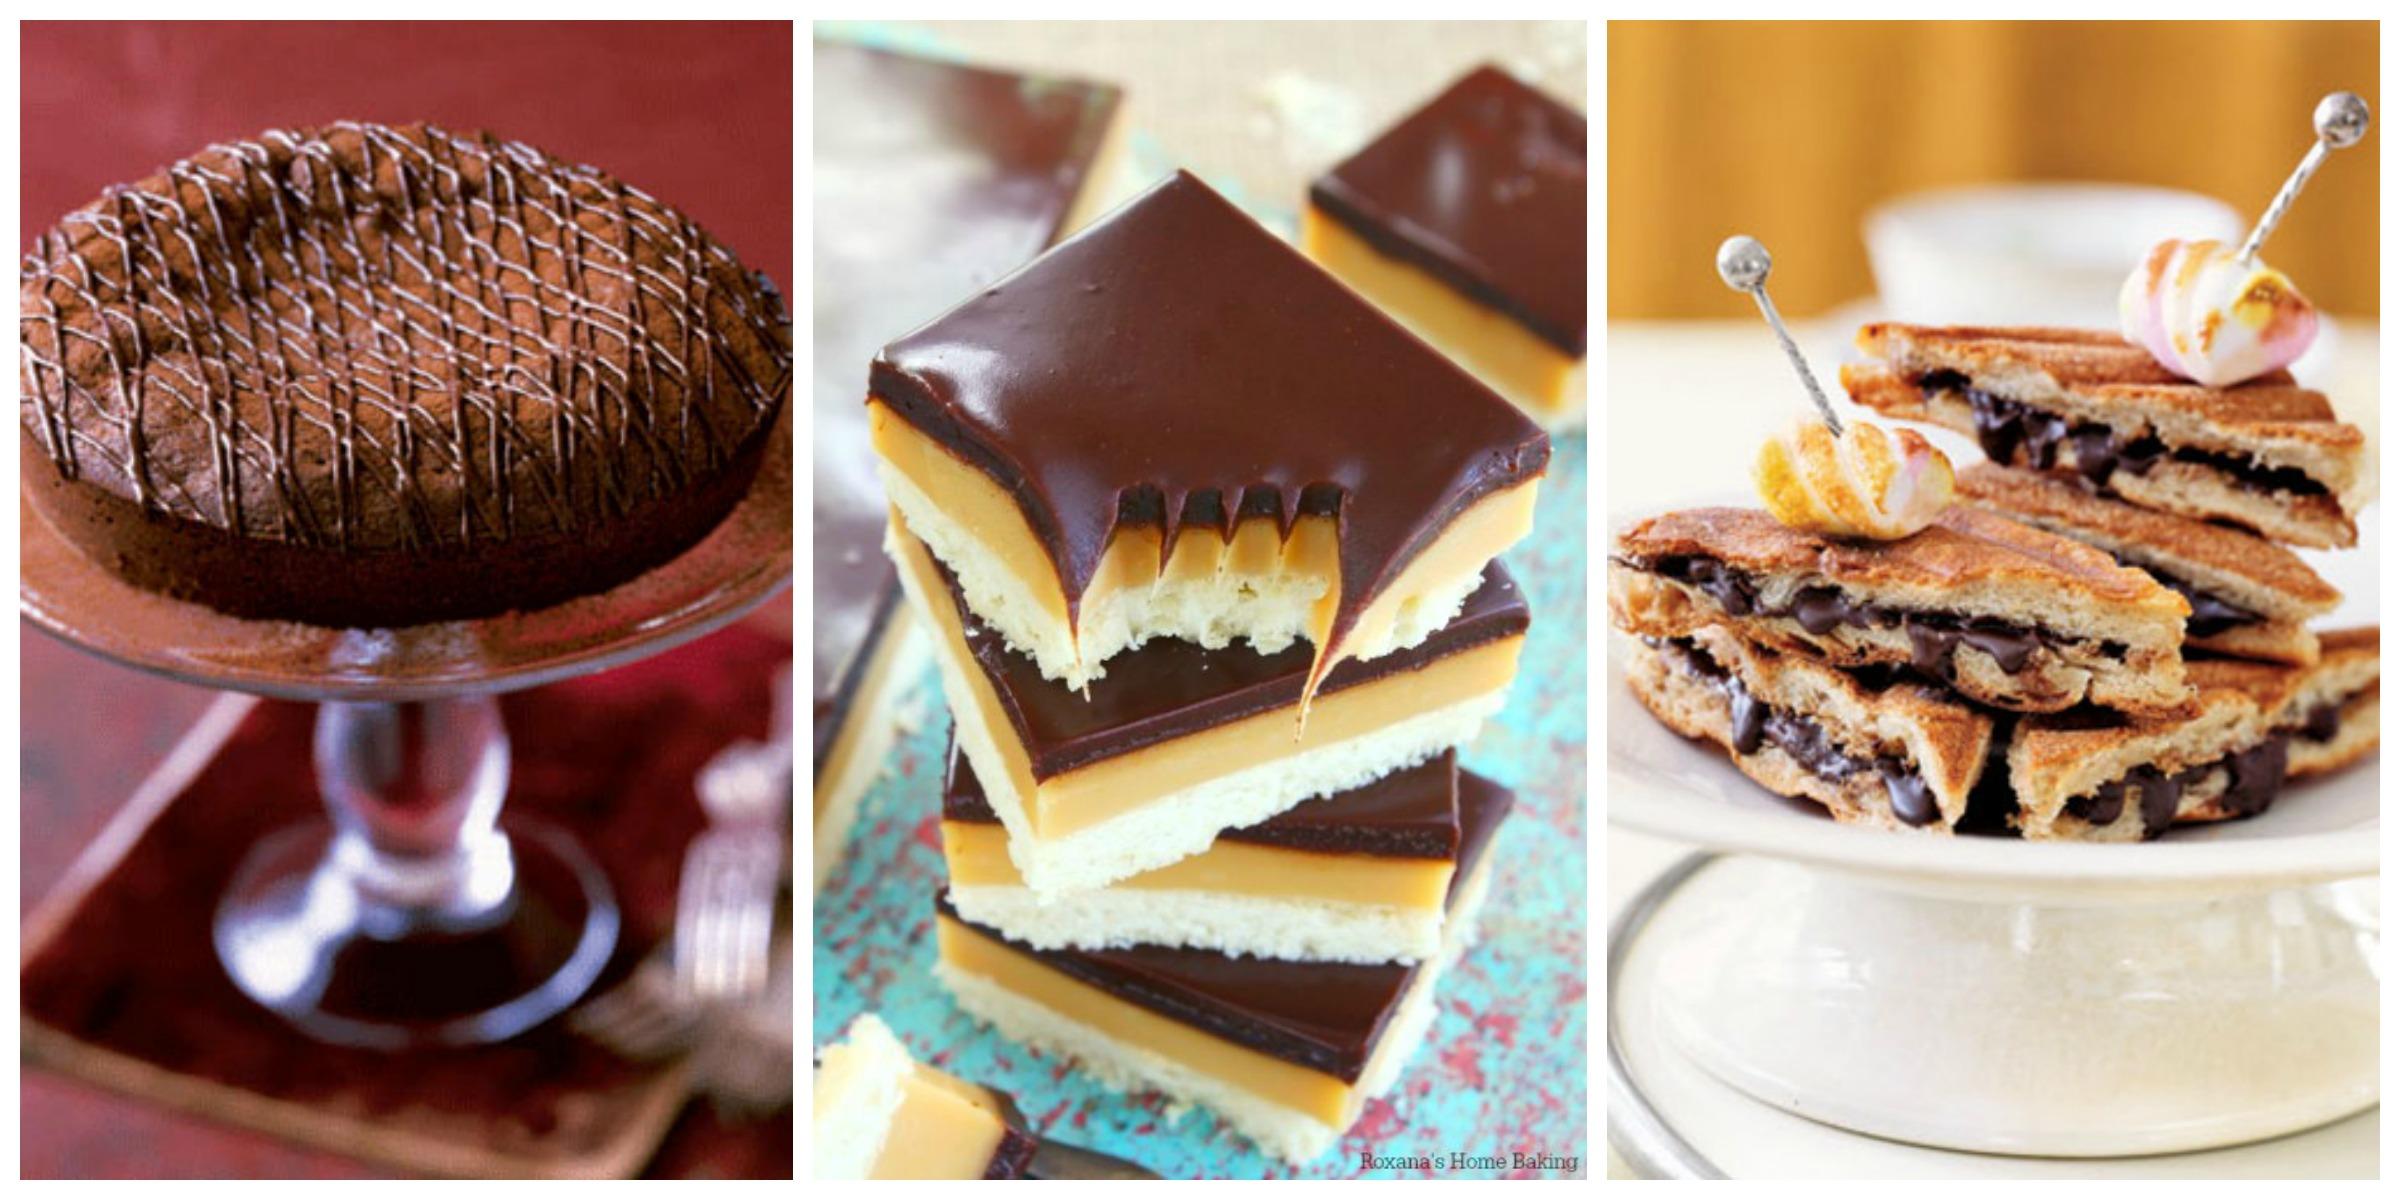 Chocolate Desserts Recipes Gallery - Best Dessert Ideas